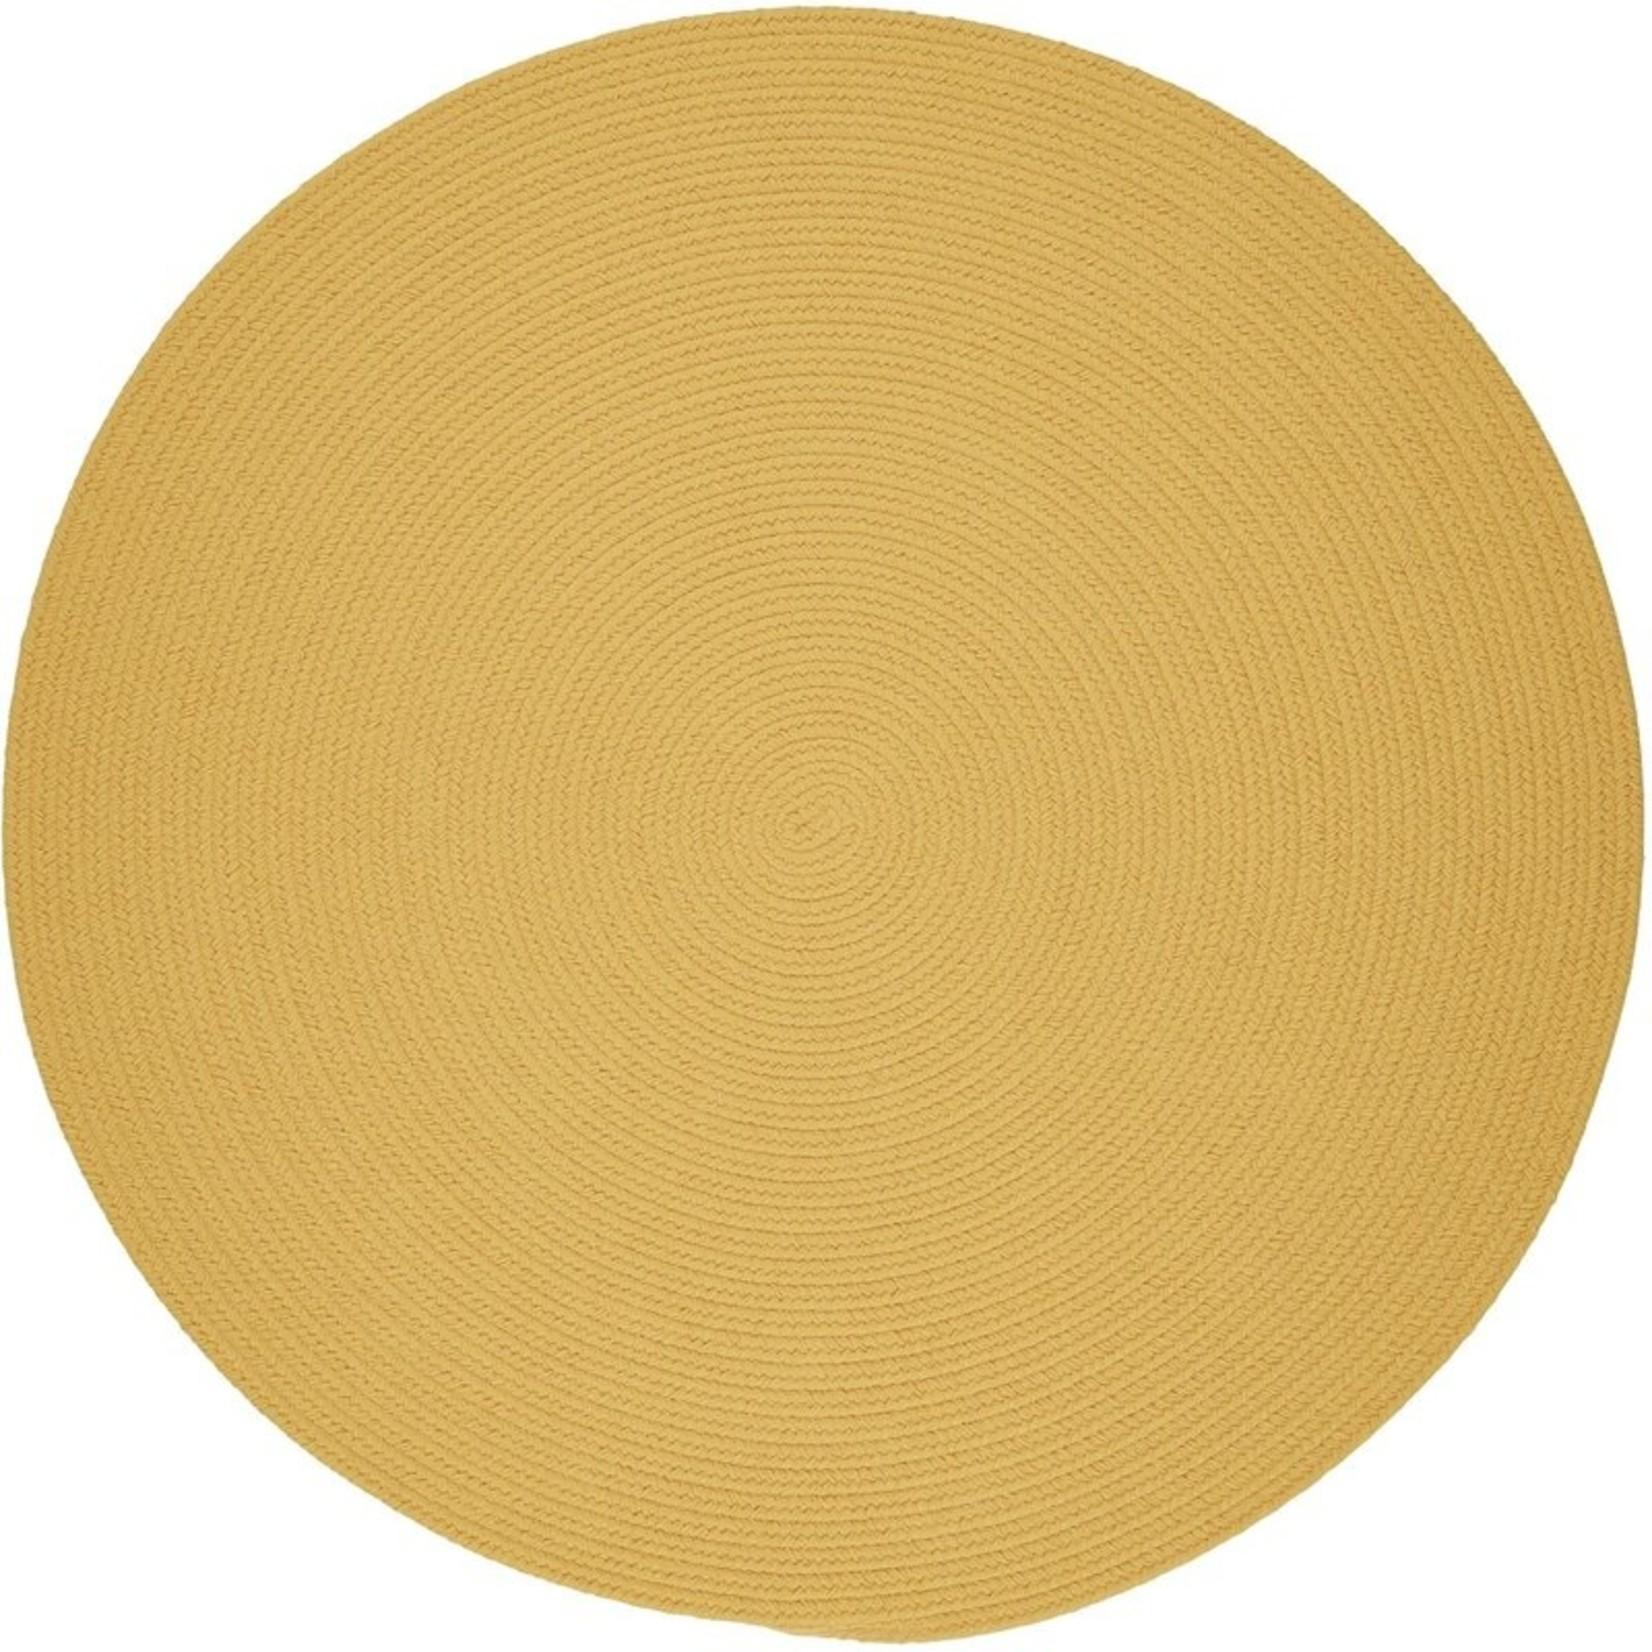 *8' Round - Smyth Hand-Braided-Yellow Indoor/Outdoor Area Rug